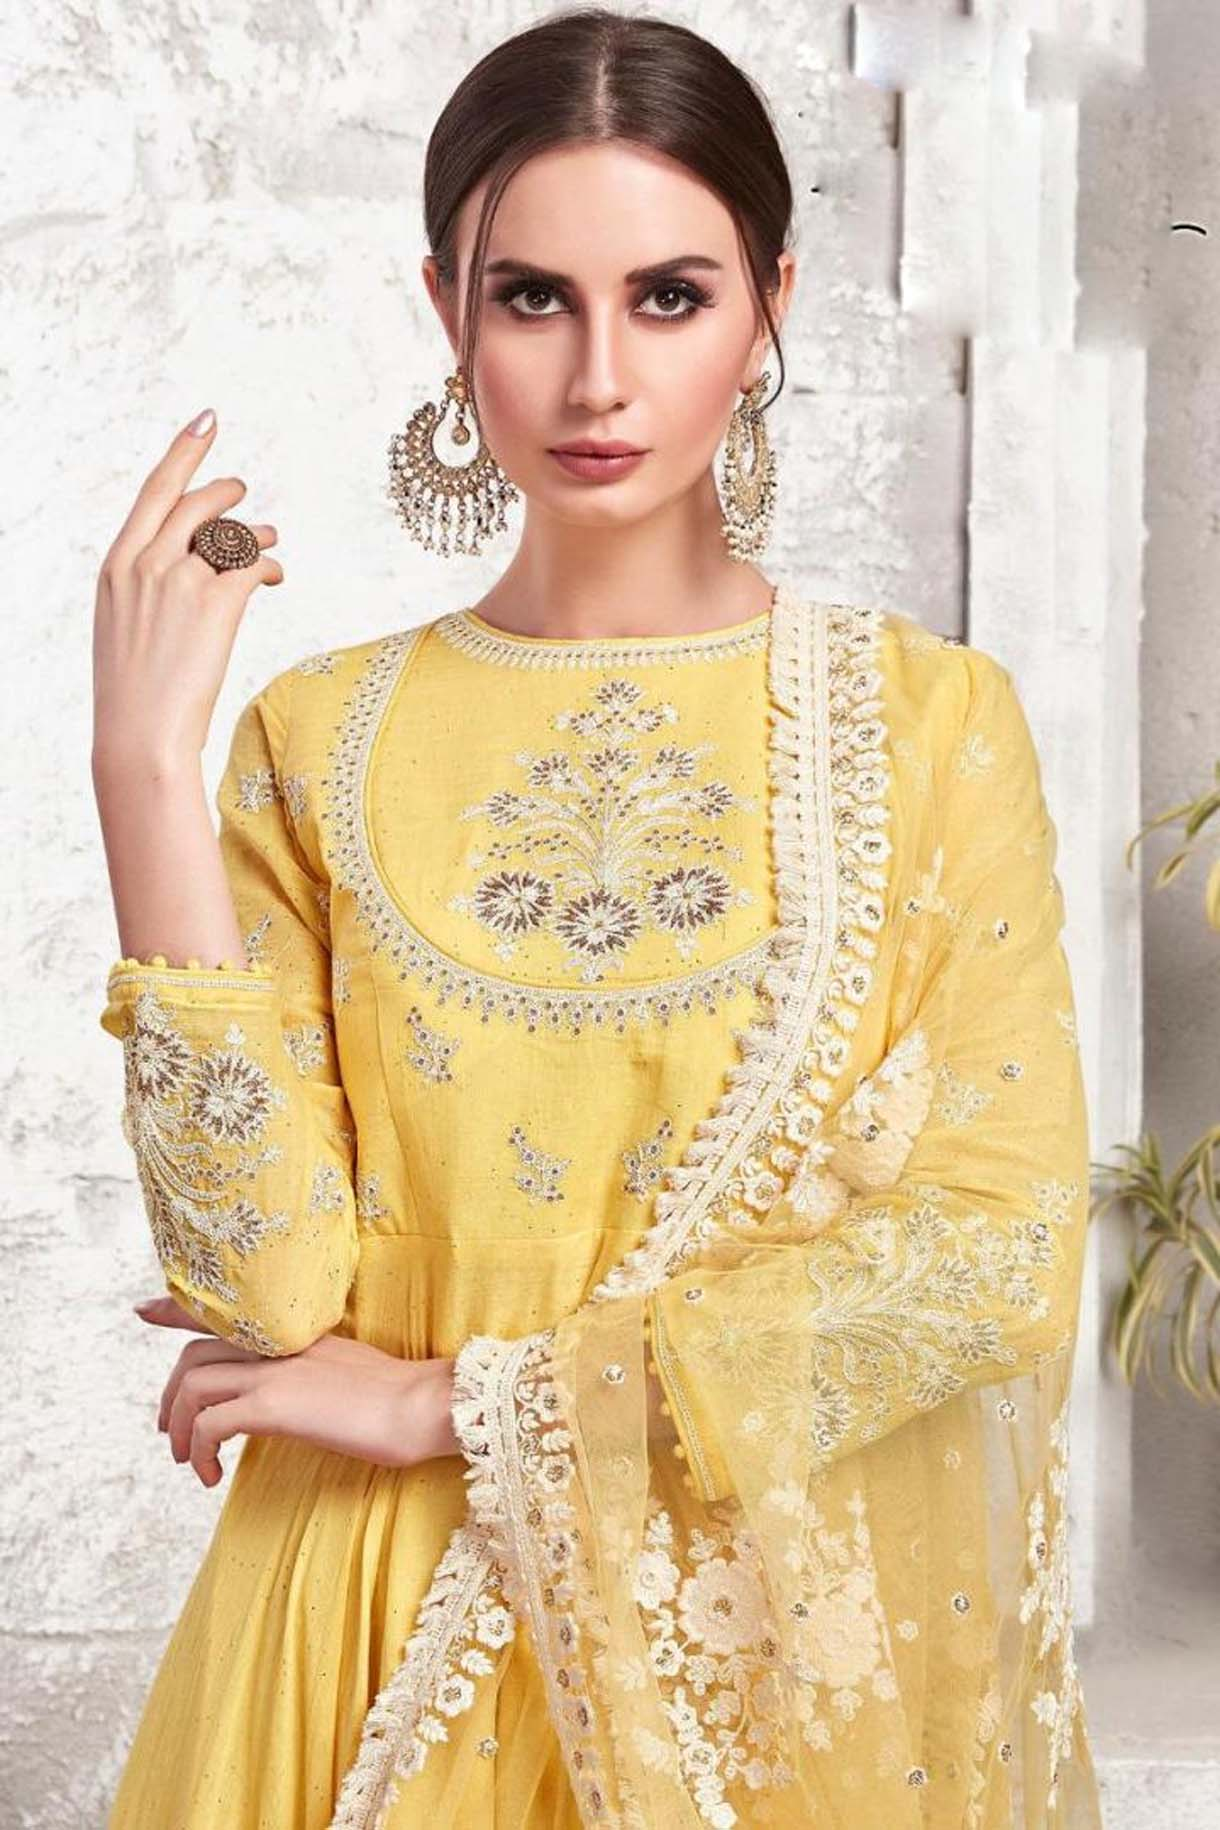 Cotton wedding Dress Plus Size in Yellow Colour for Haldi Function